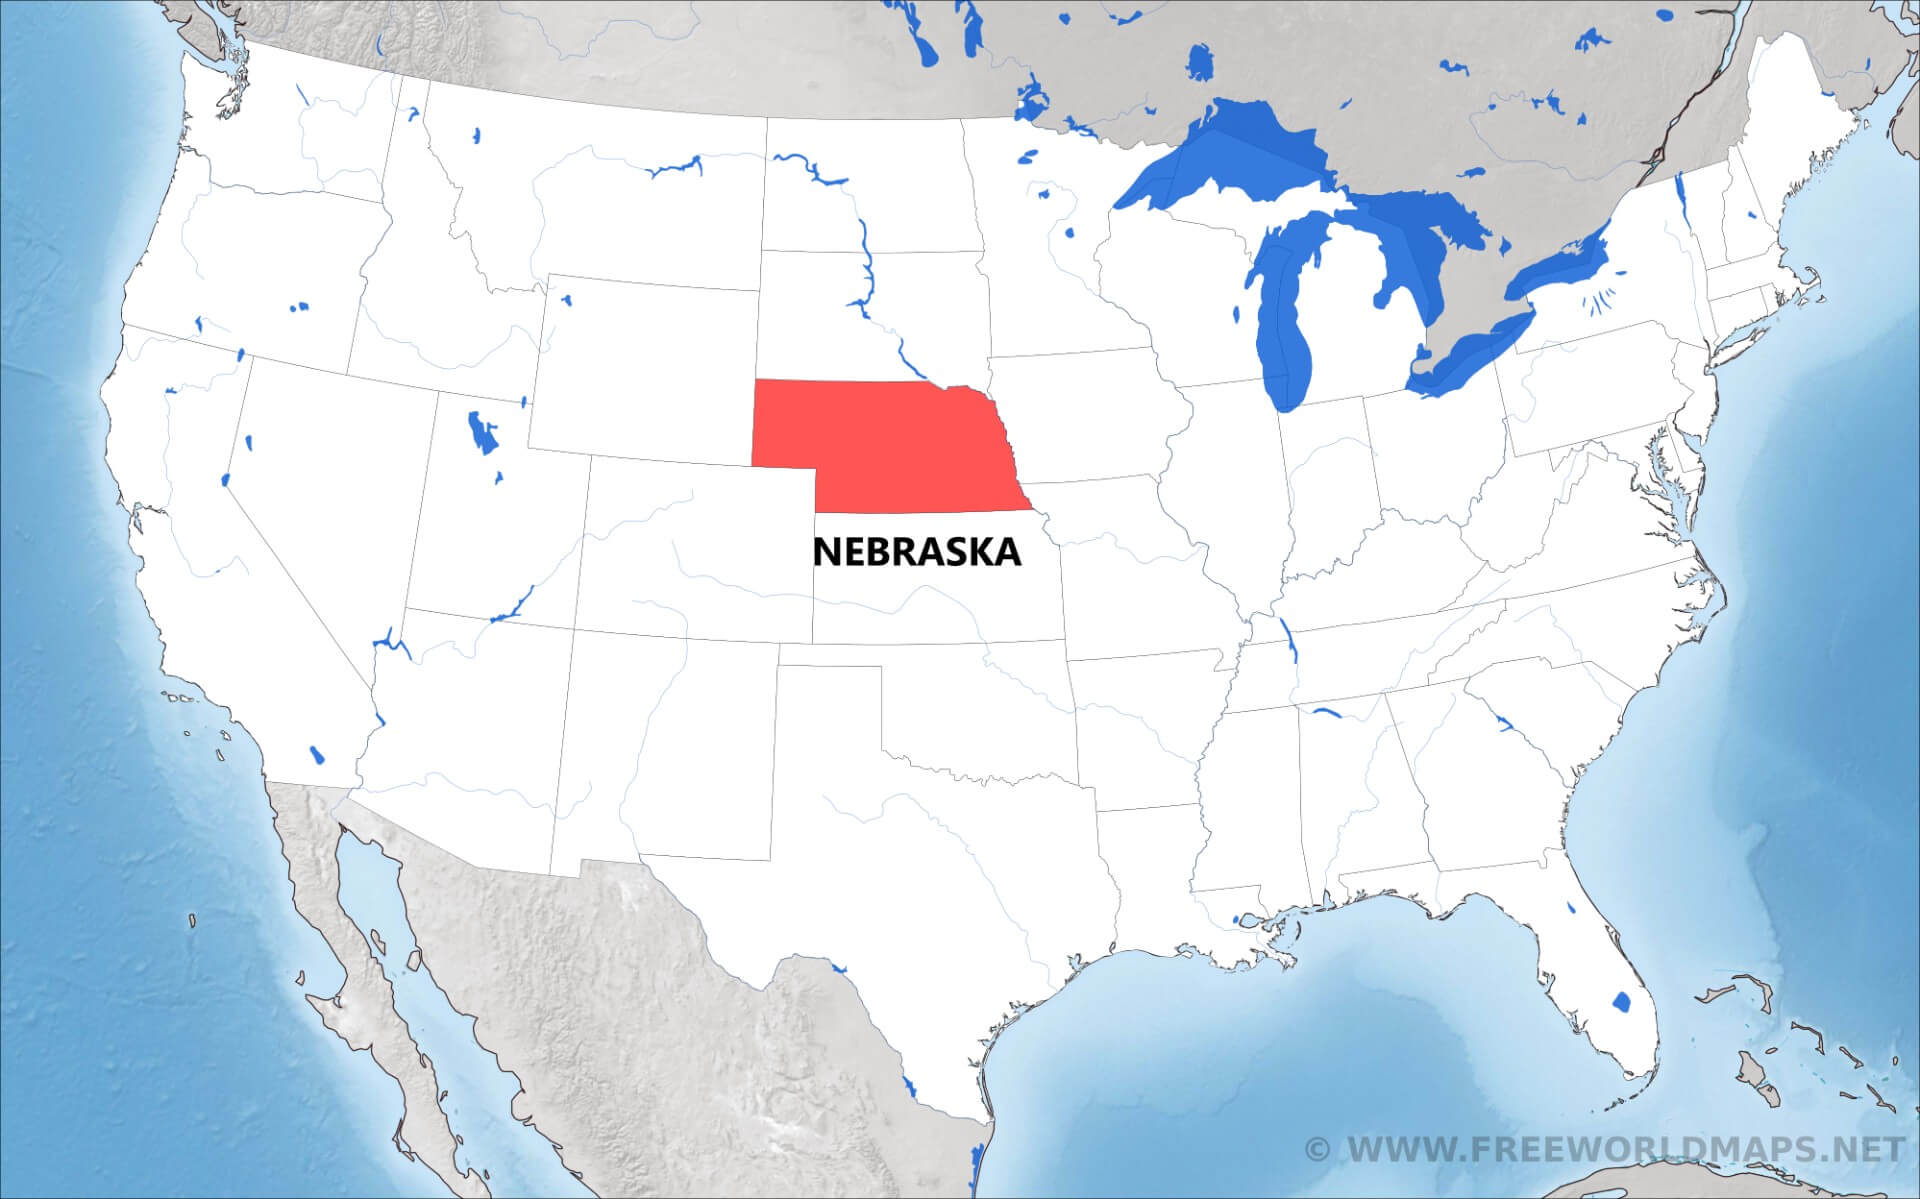 Nebraska location highlighted on the us map